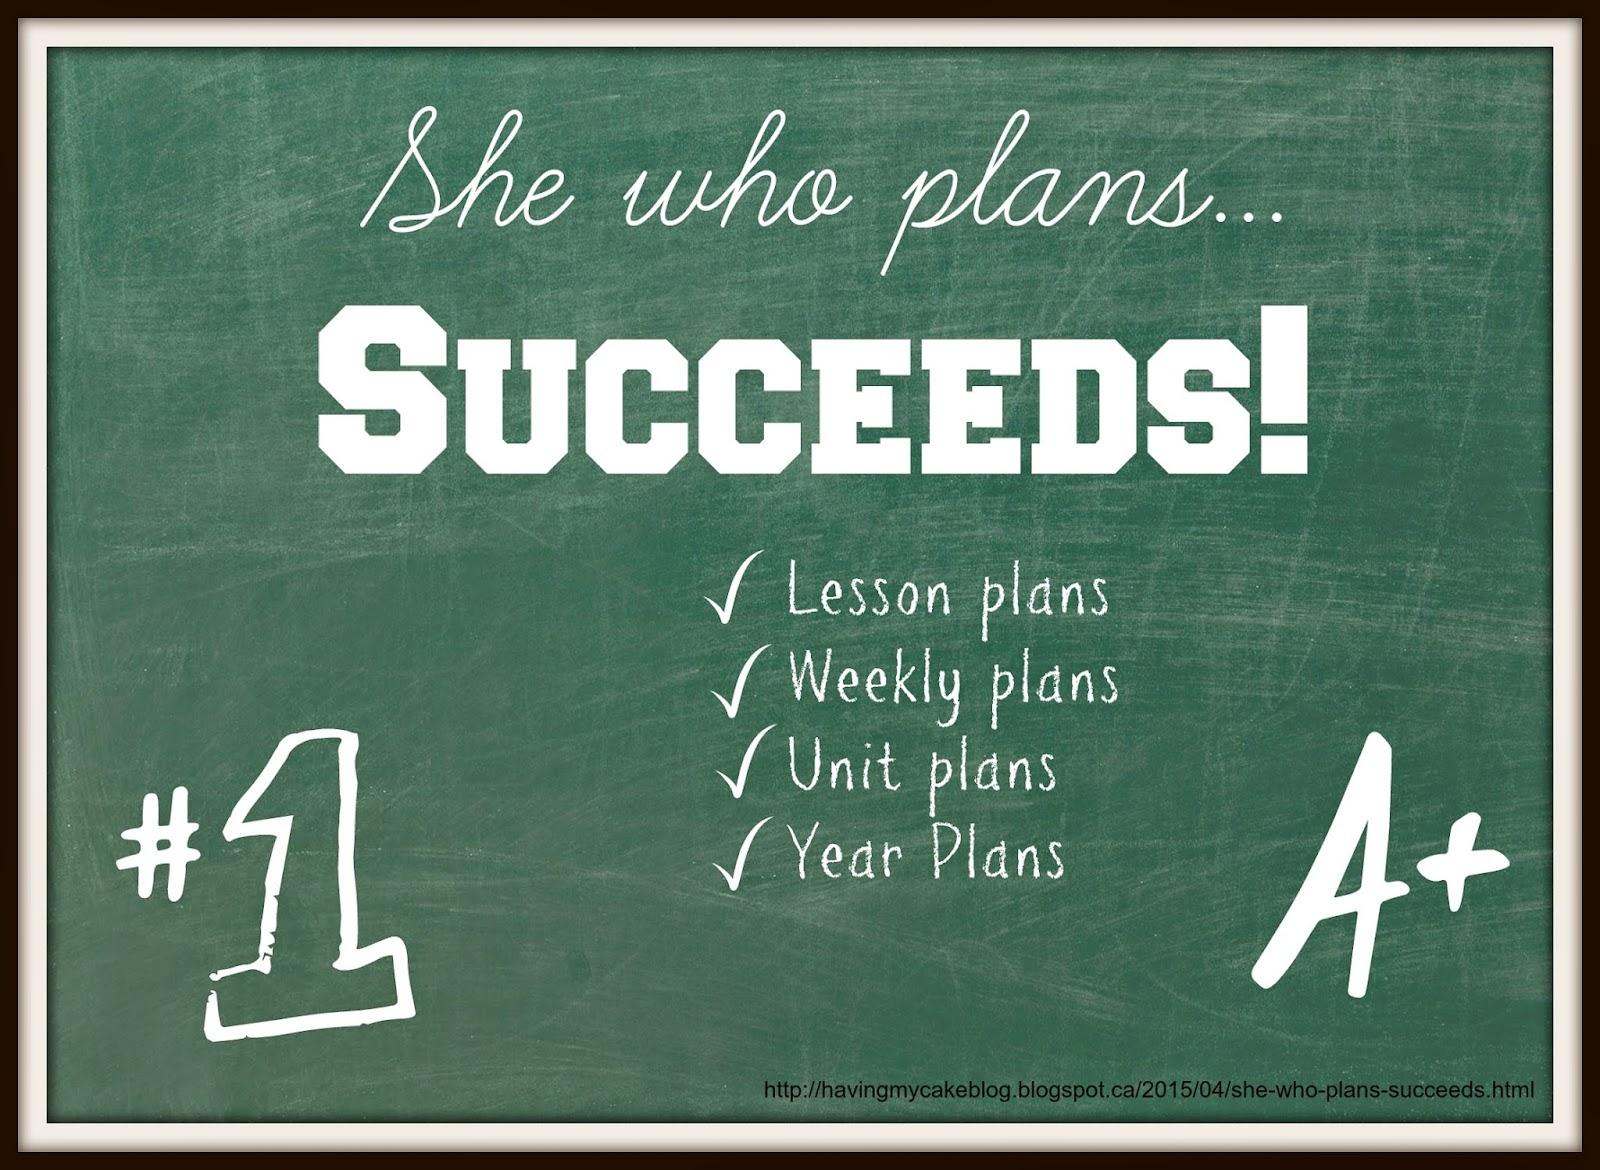 http://havingmycakeblog.blogspot.ca/2015/04/she-who-plans-succeeds.html